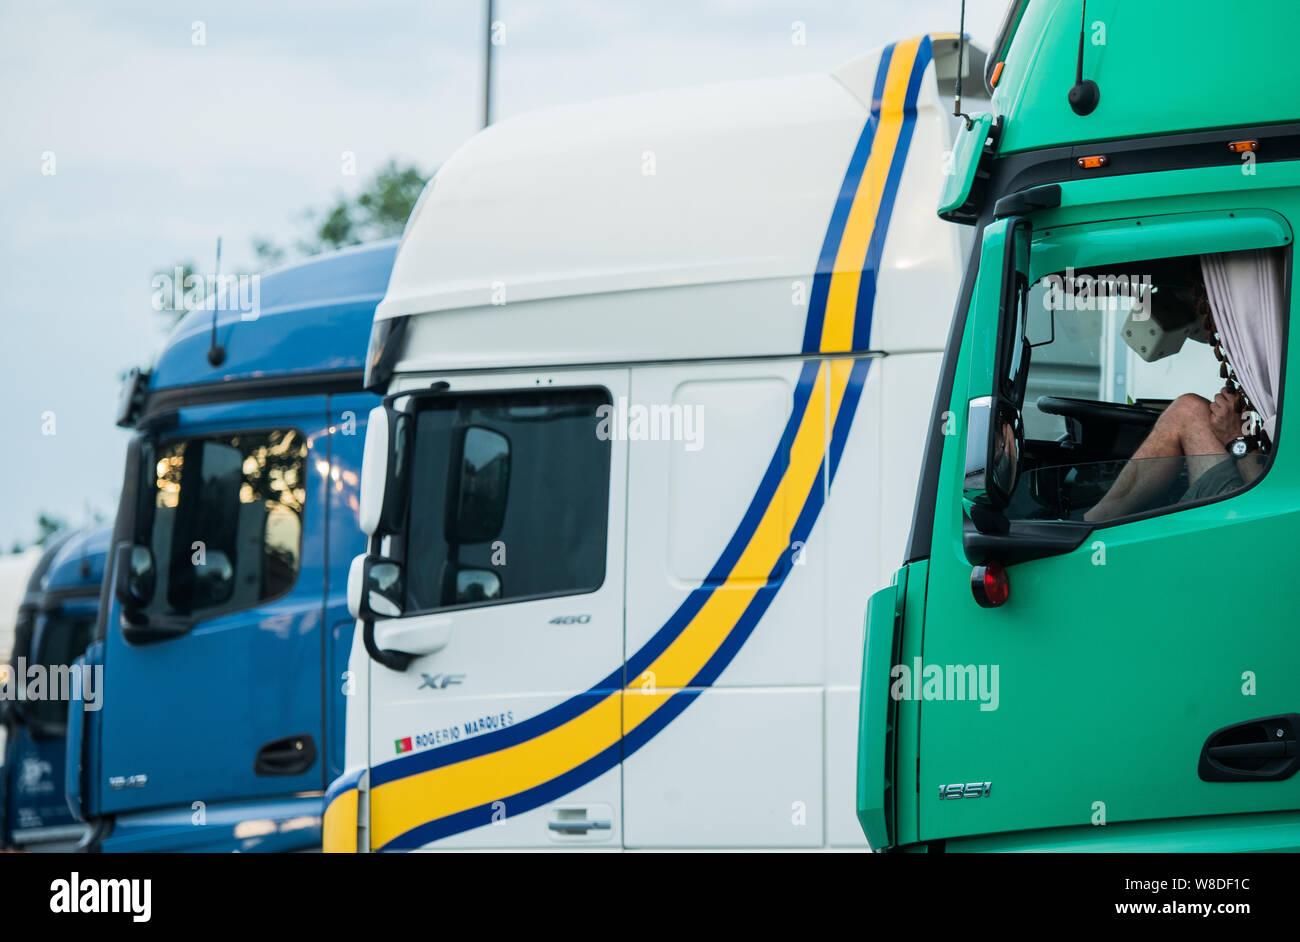 Overloaded Vehicle Stock Photos & Overloaded Vehicle Stock